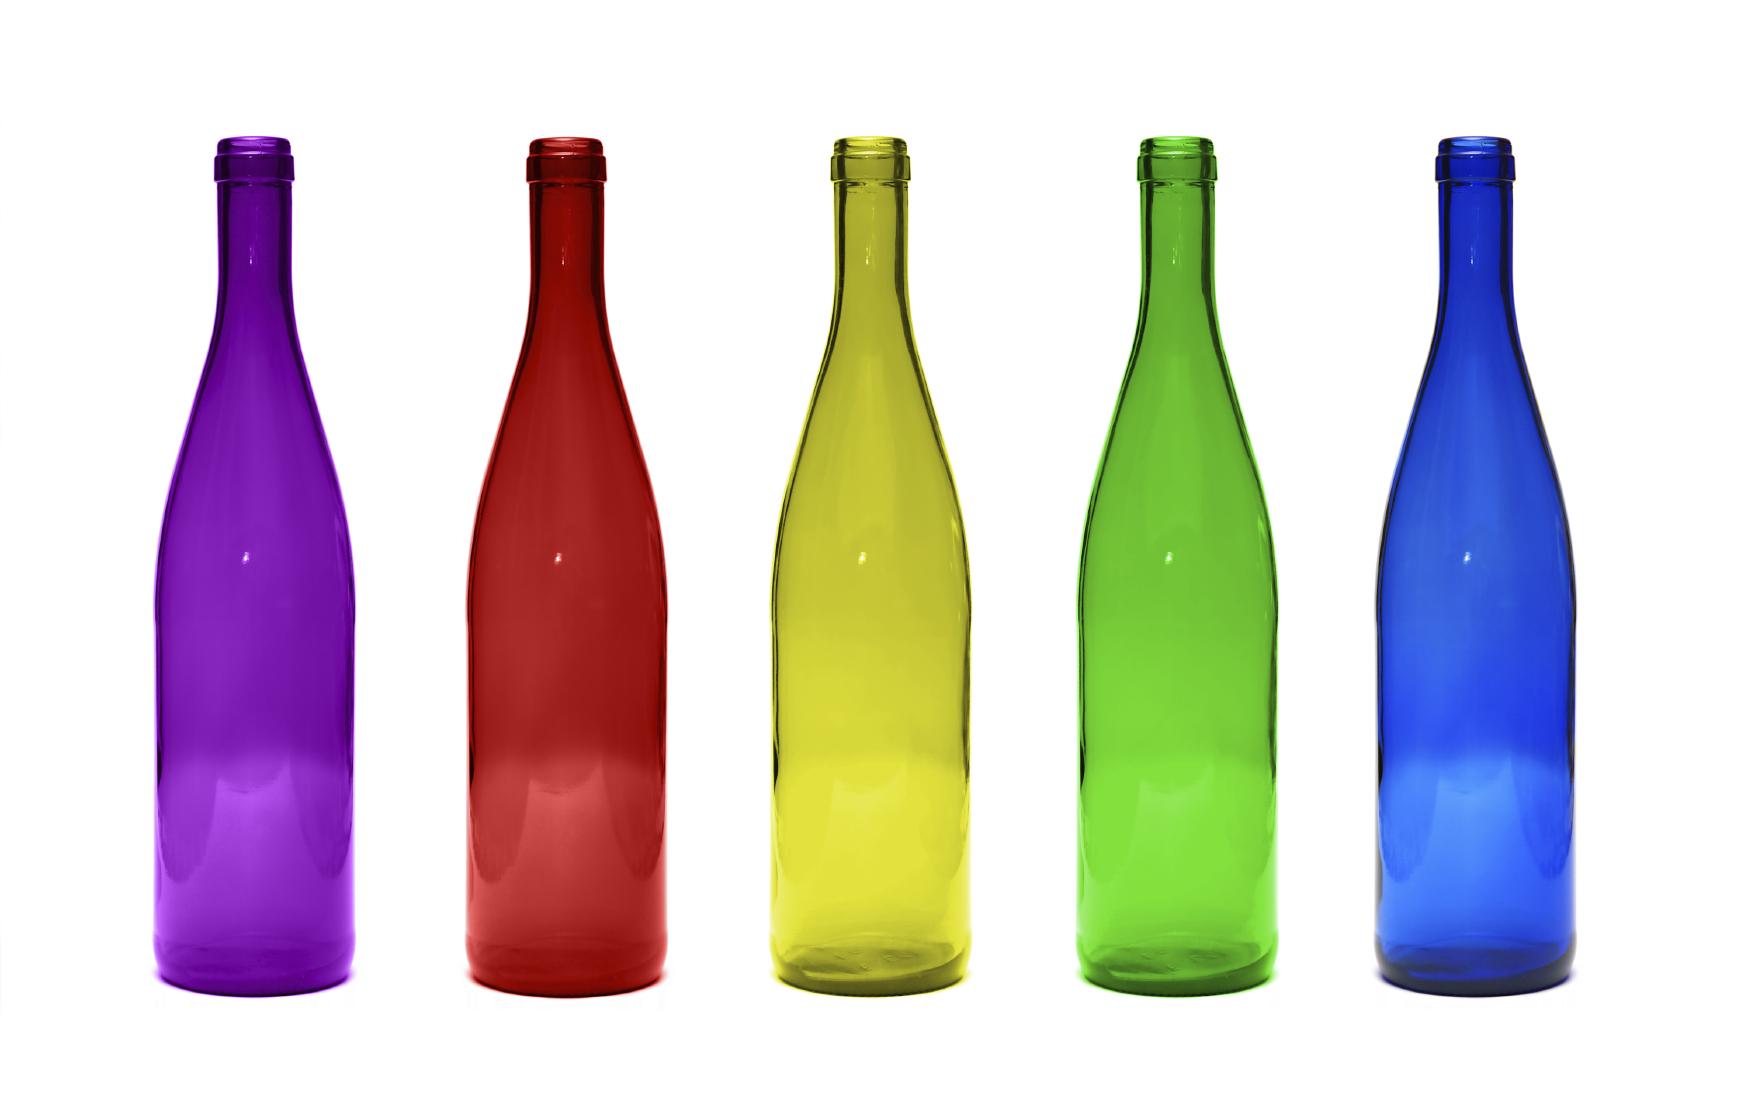 1748x1098 > Bottles Wallpapers